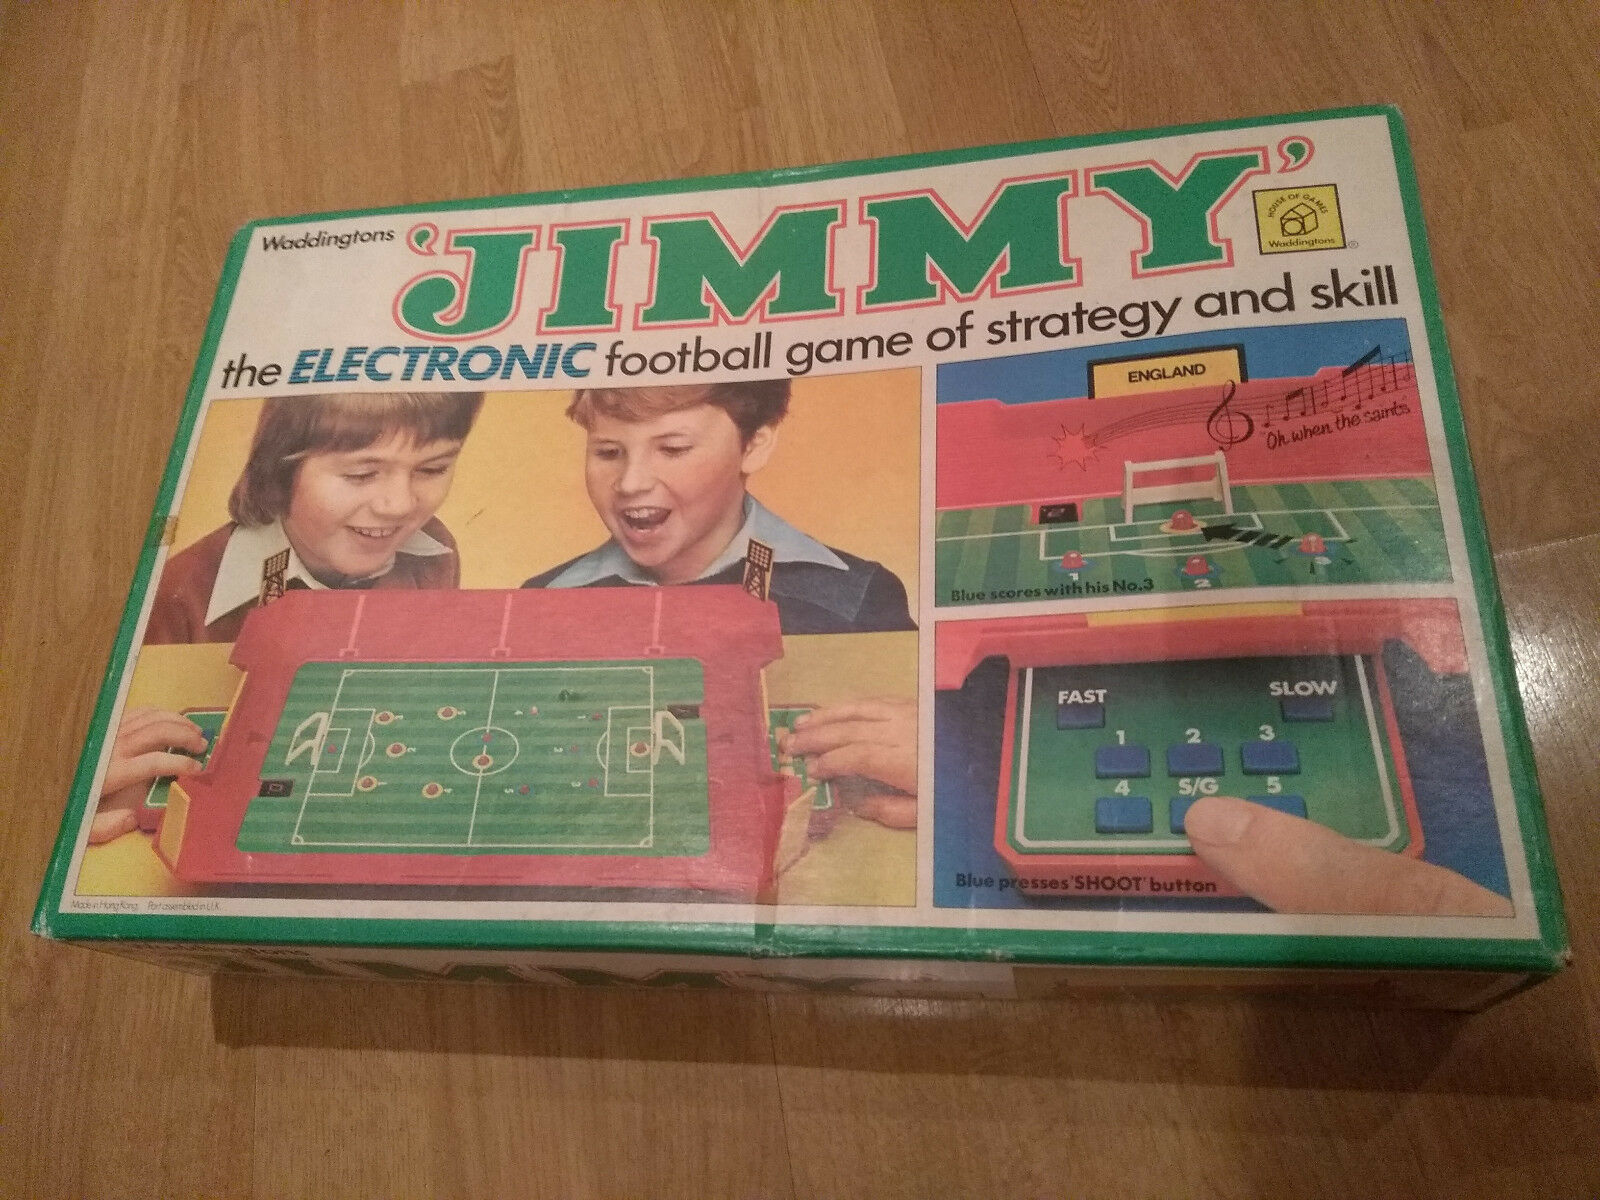 WADDINGTONS JIMMY ELECTRONIC FOOTBALL BOX VINTAGE 1980 GAME EXC COND FREE UK P&P